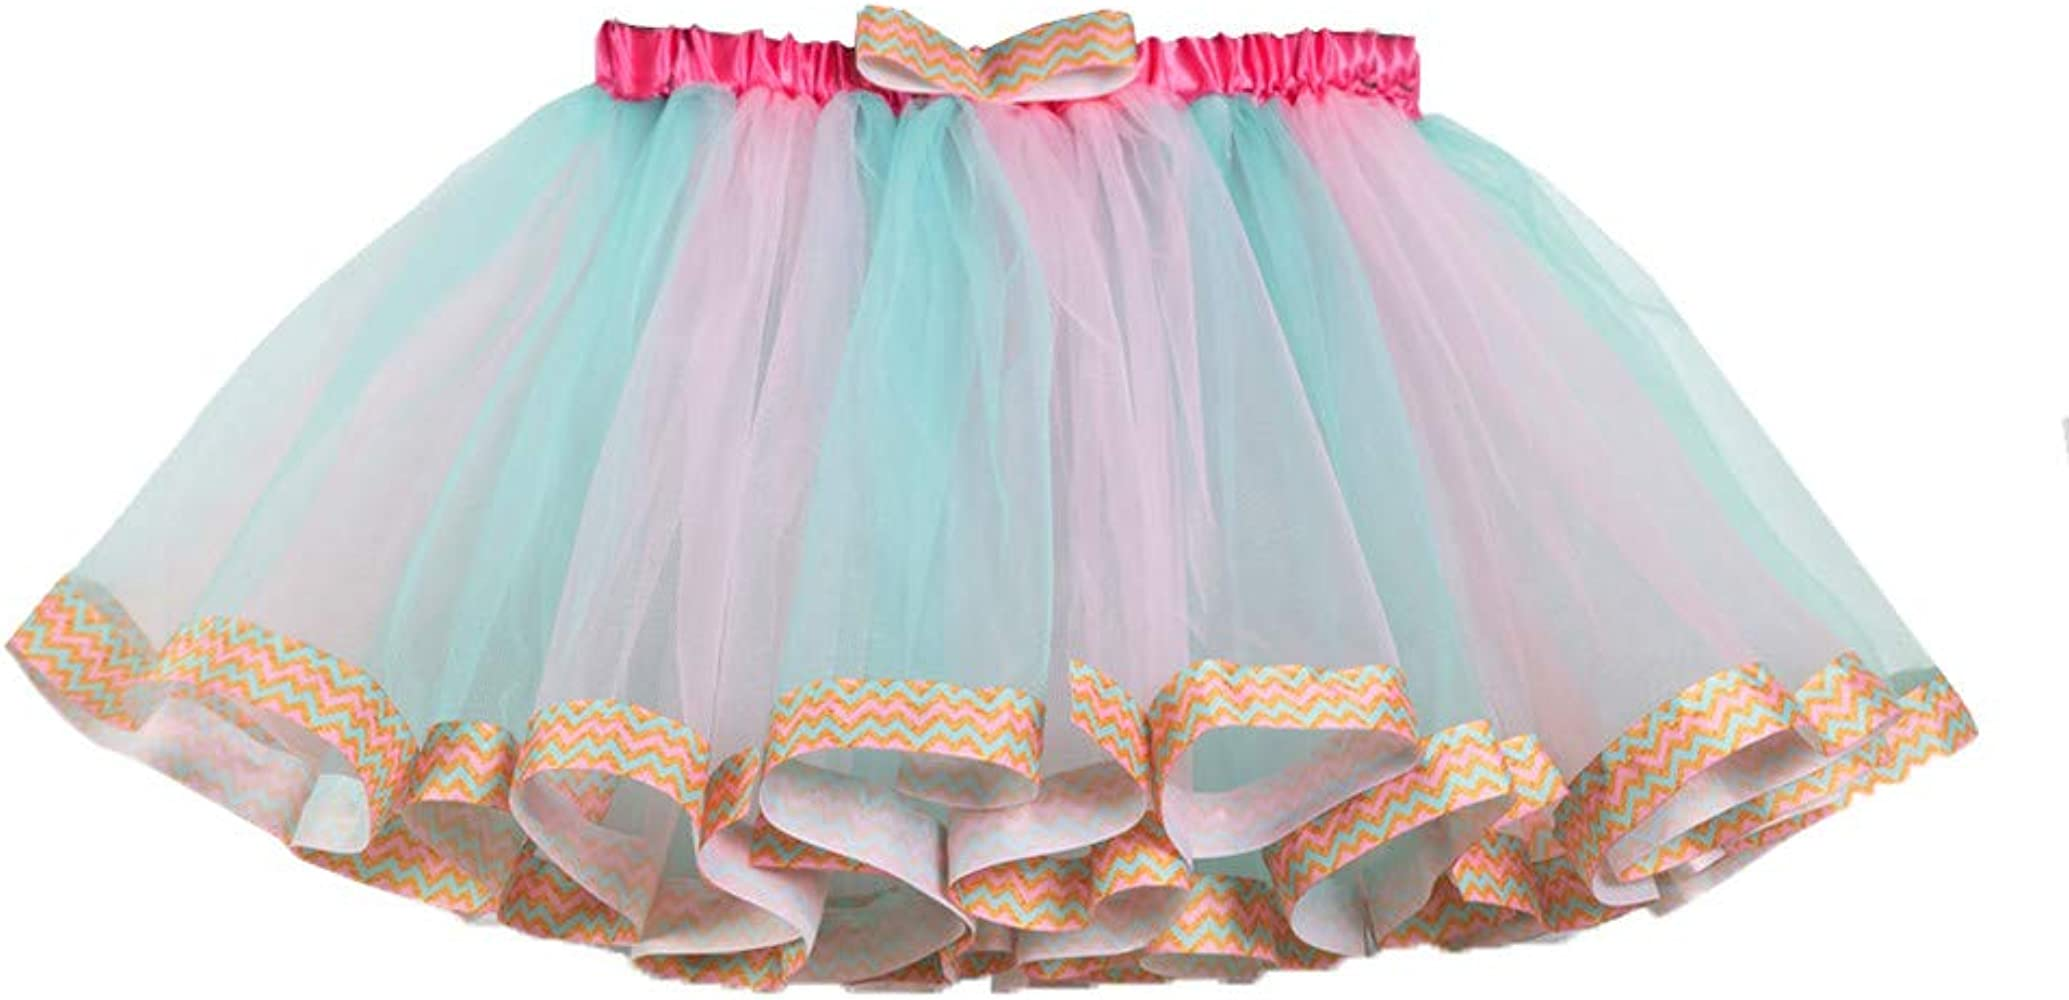 Tul Tutú Falda para Niña Vestido de Niñas Bebés Disfraz para ...